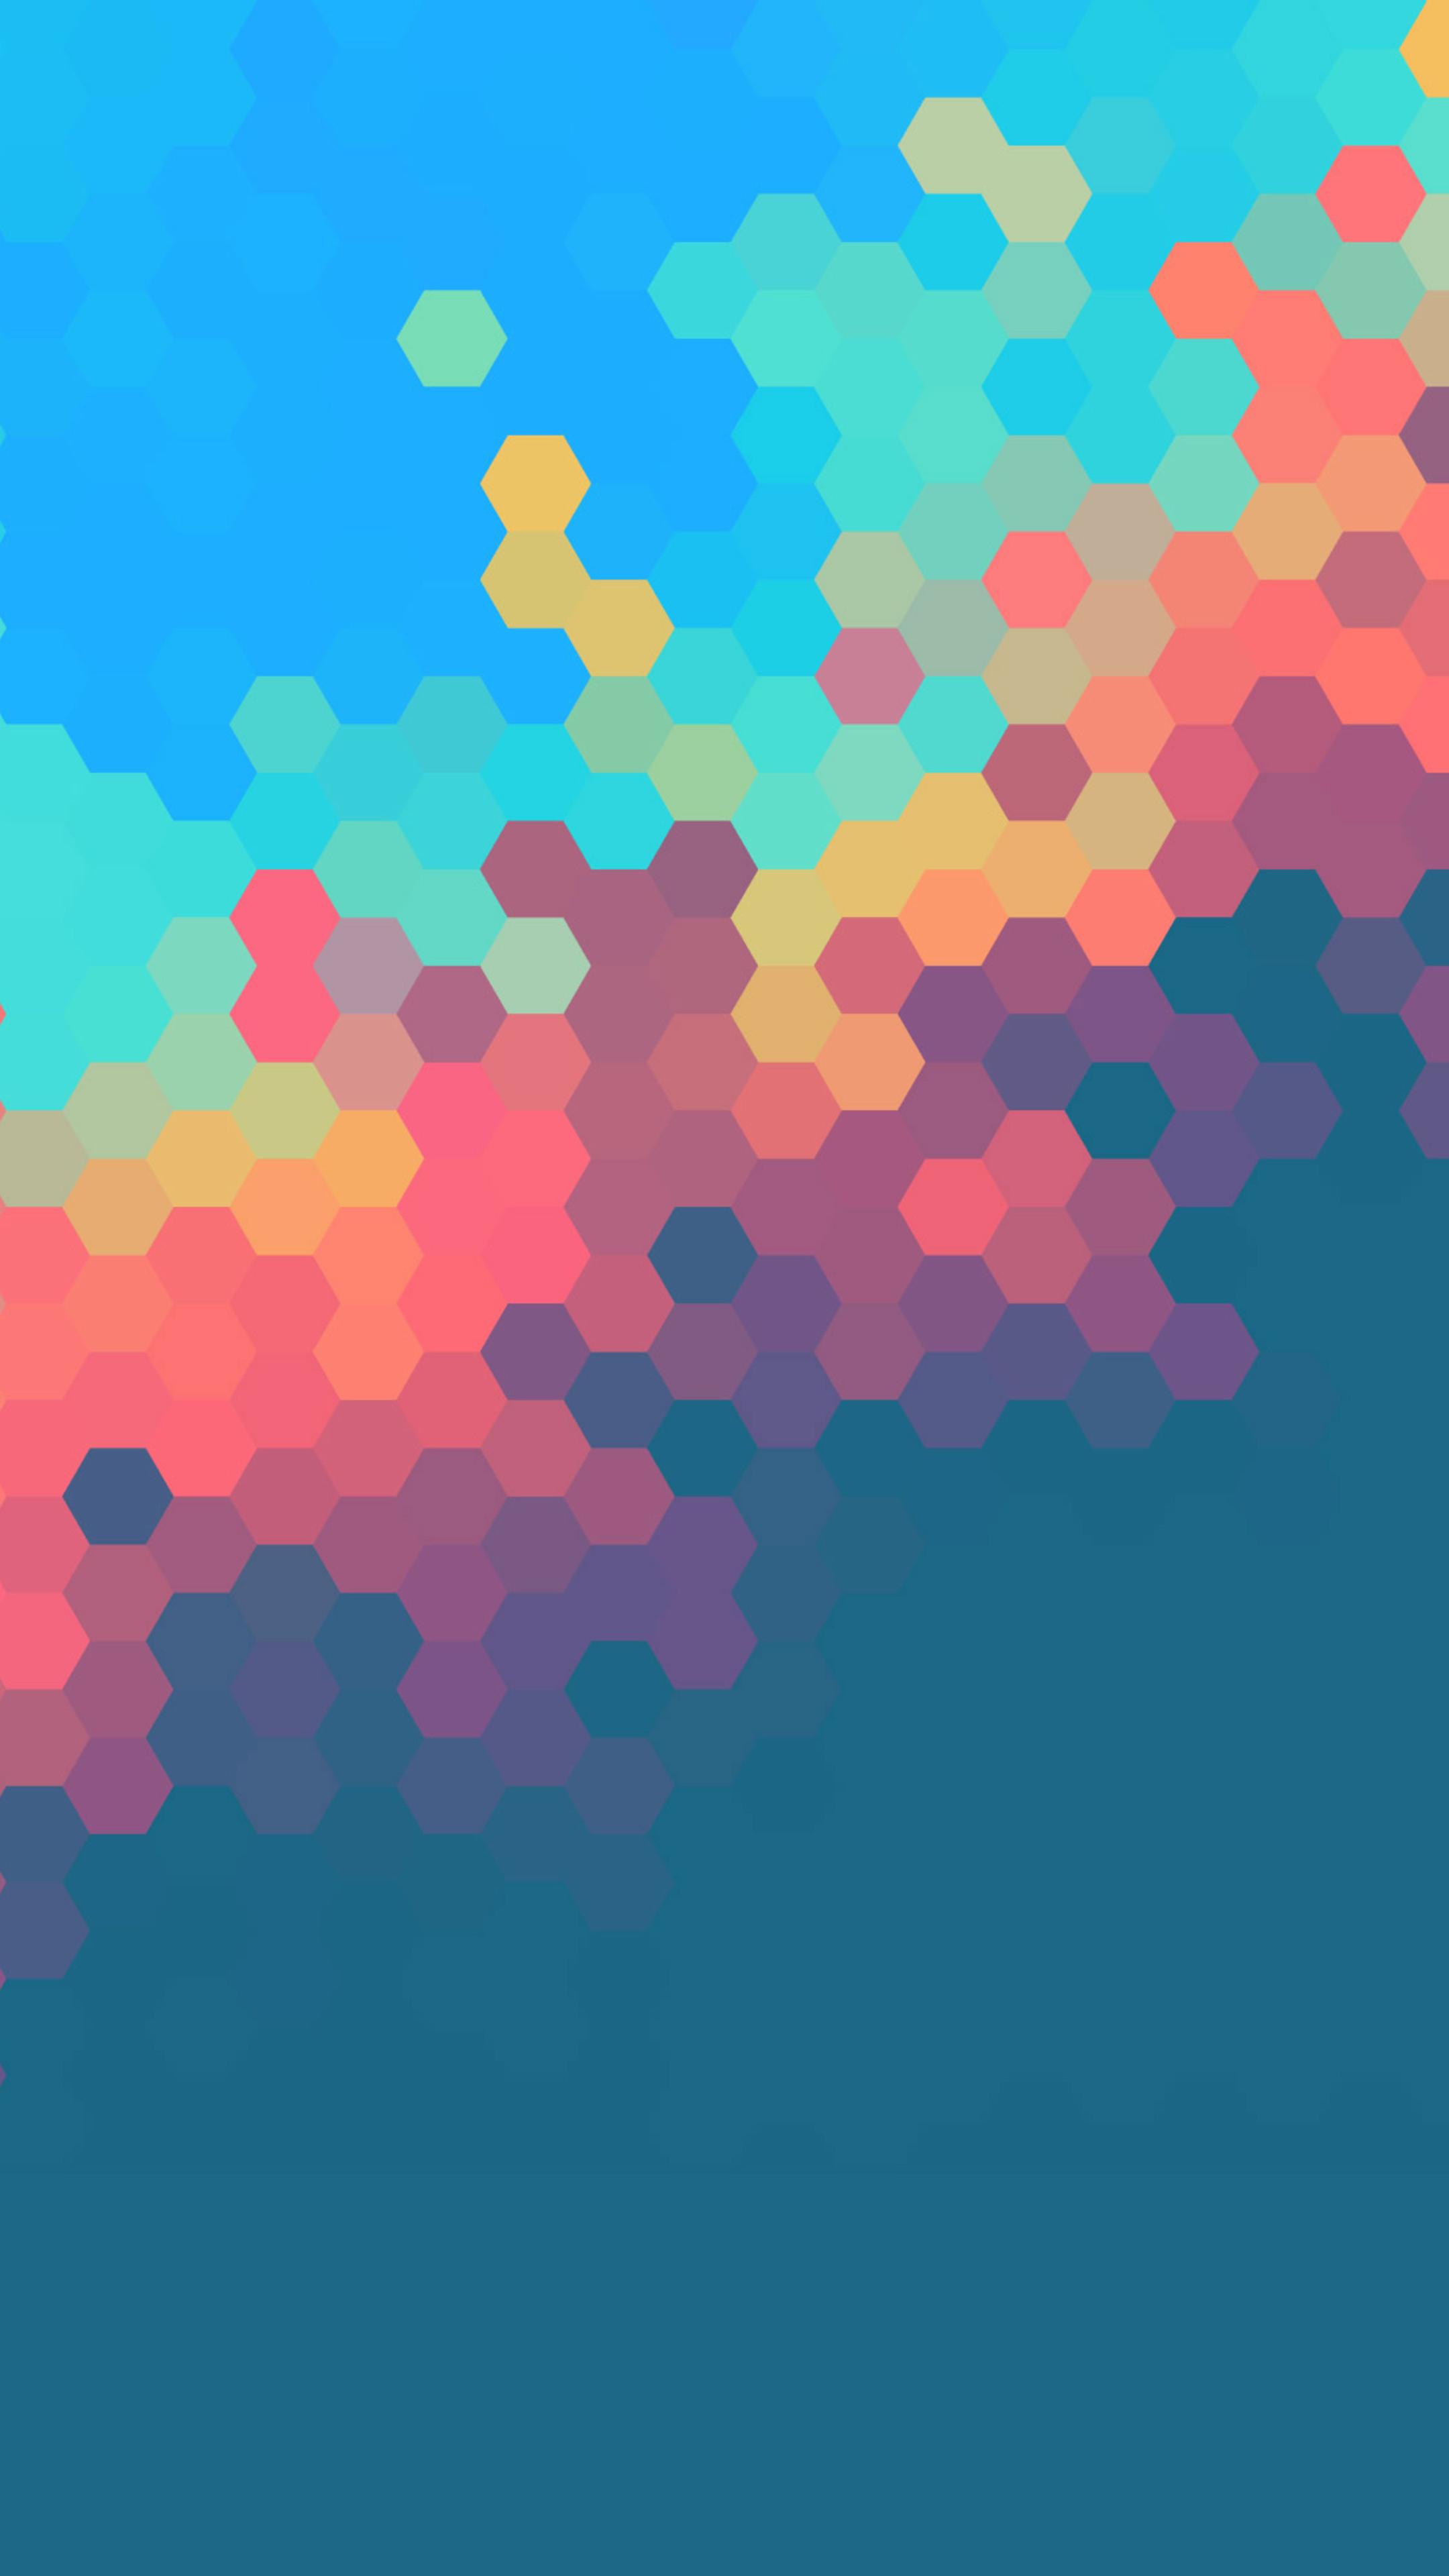 2160x3840 hex abstract material design sony xperia x xz z5 - Art wallpaper 2160x3840 ...